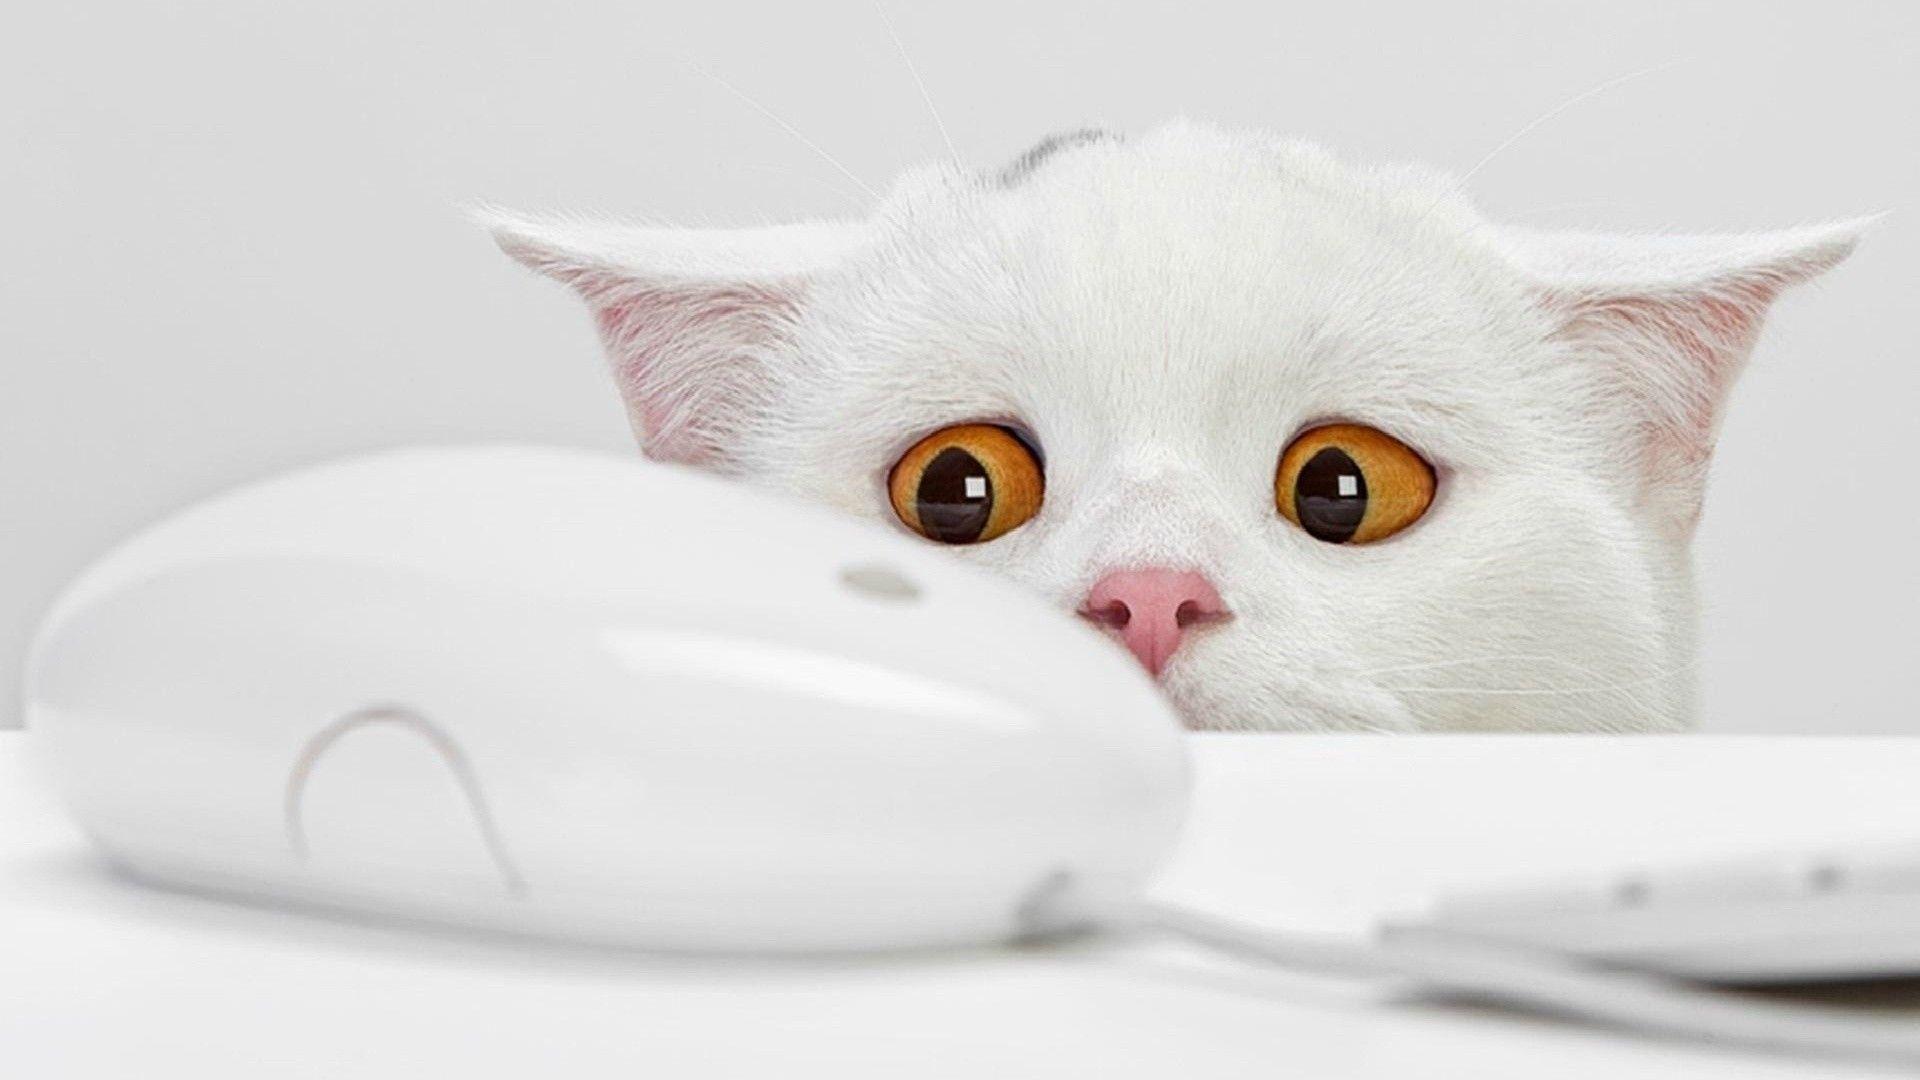 General 1920x1080 cats animals white bright orange eyes computer computer mice